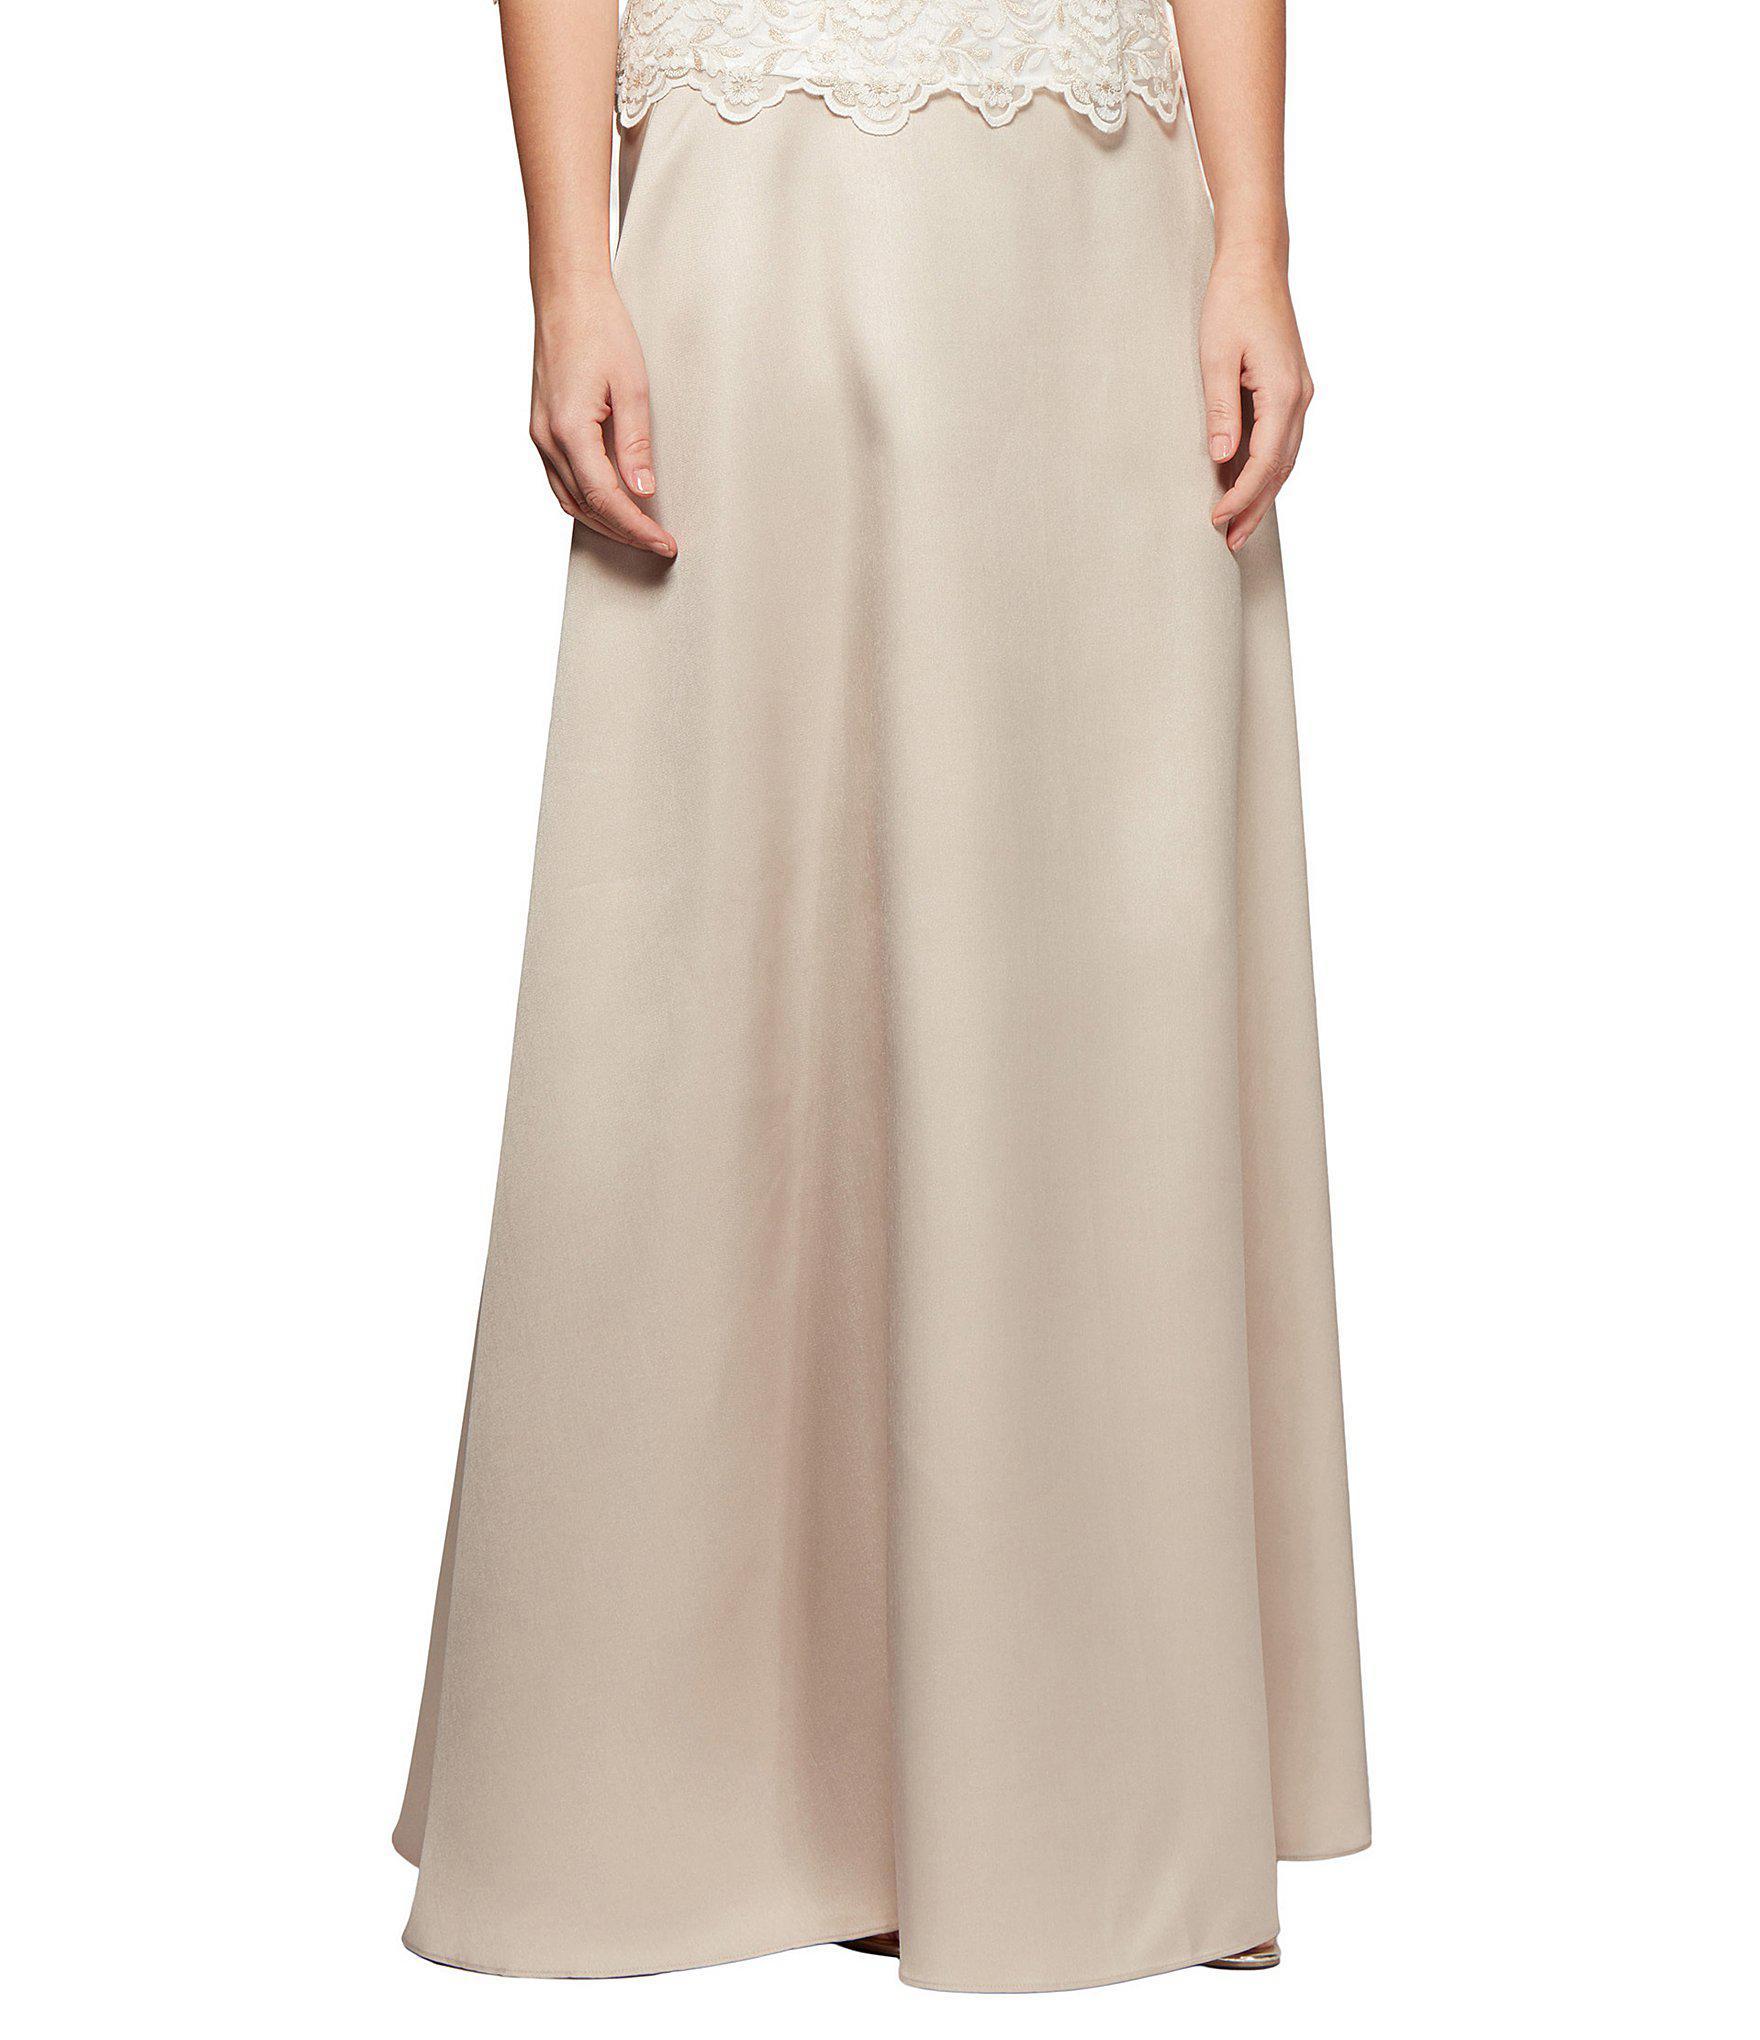 f777cee61b1 Petite Size Long Skirts - Gomes Weine AG